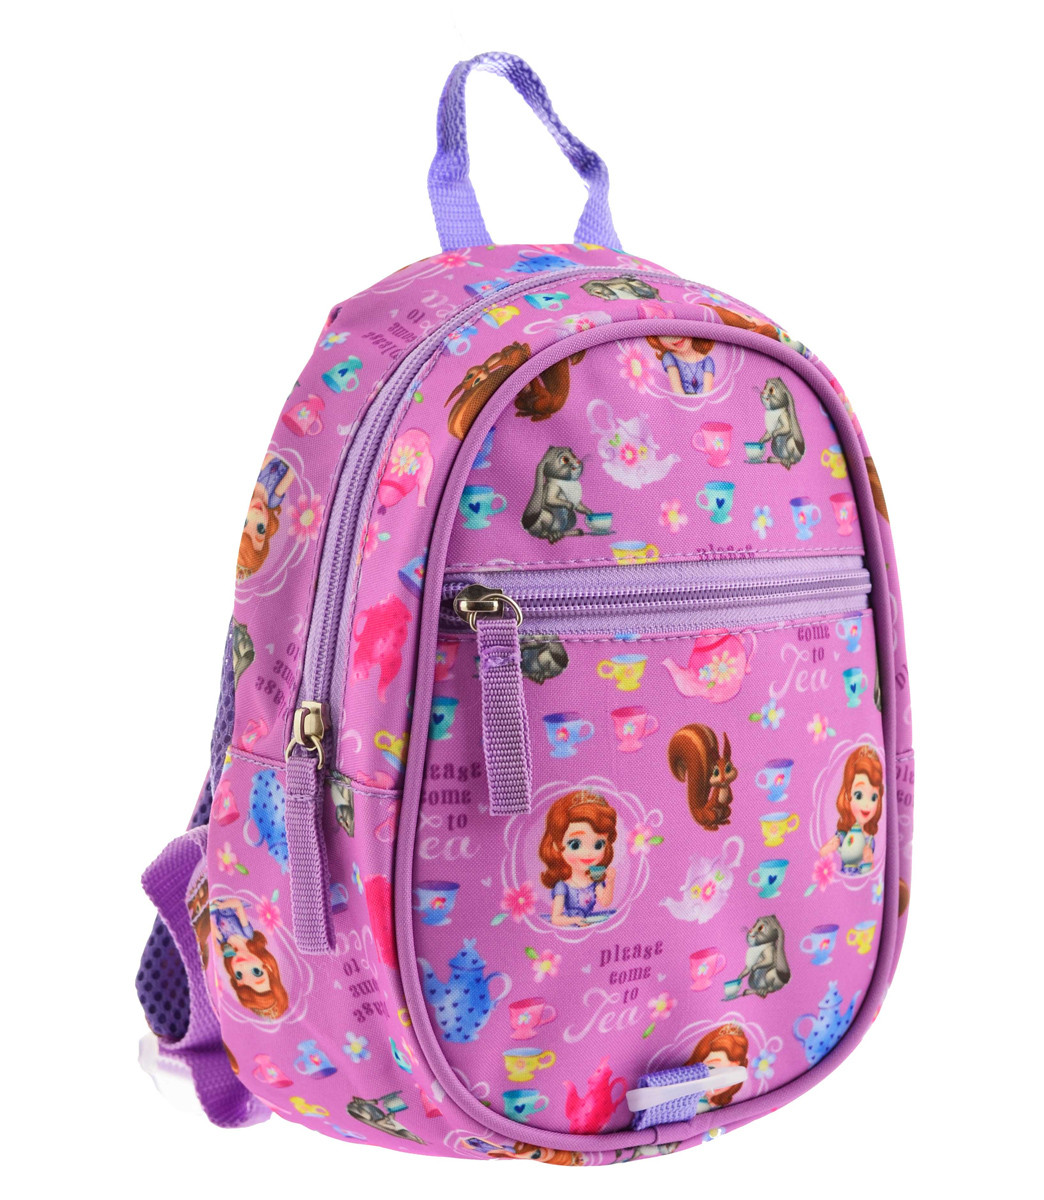 Рюкзак детский K-31 Sofia 556839 1 Вересня